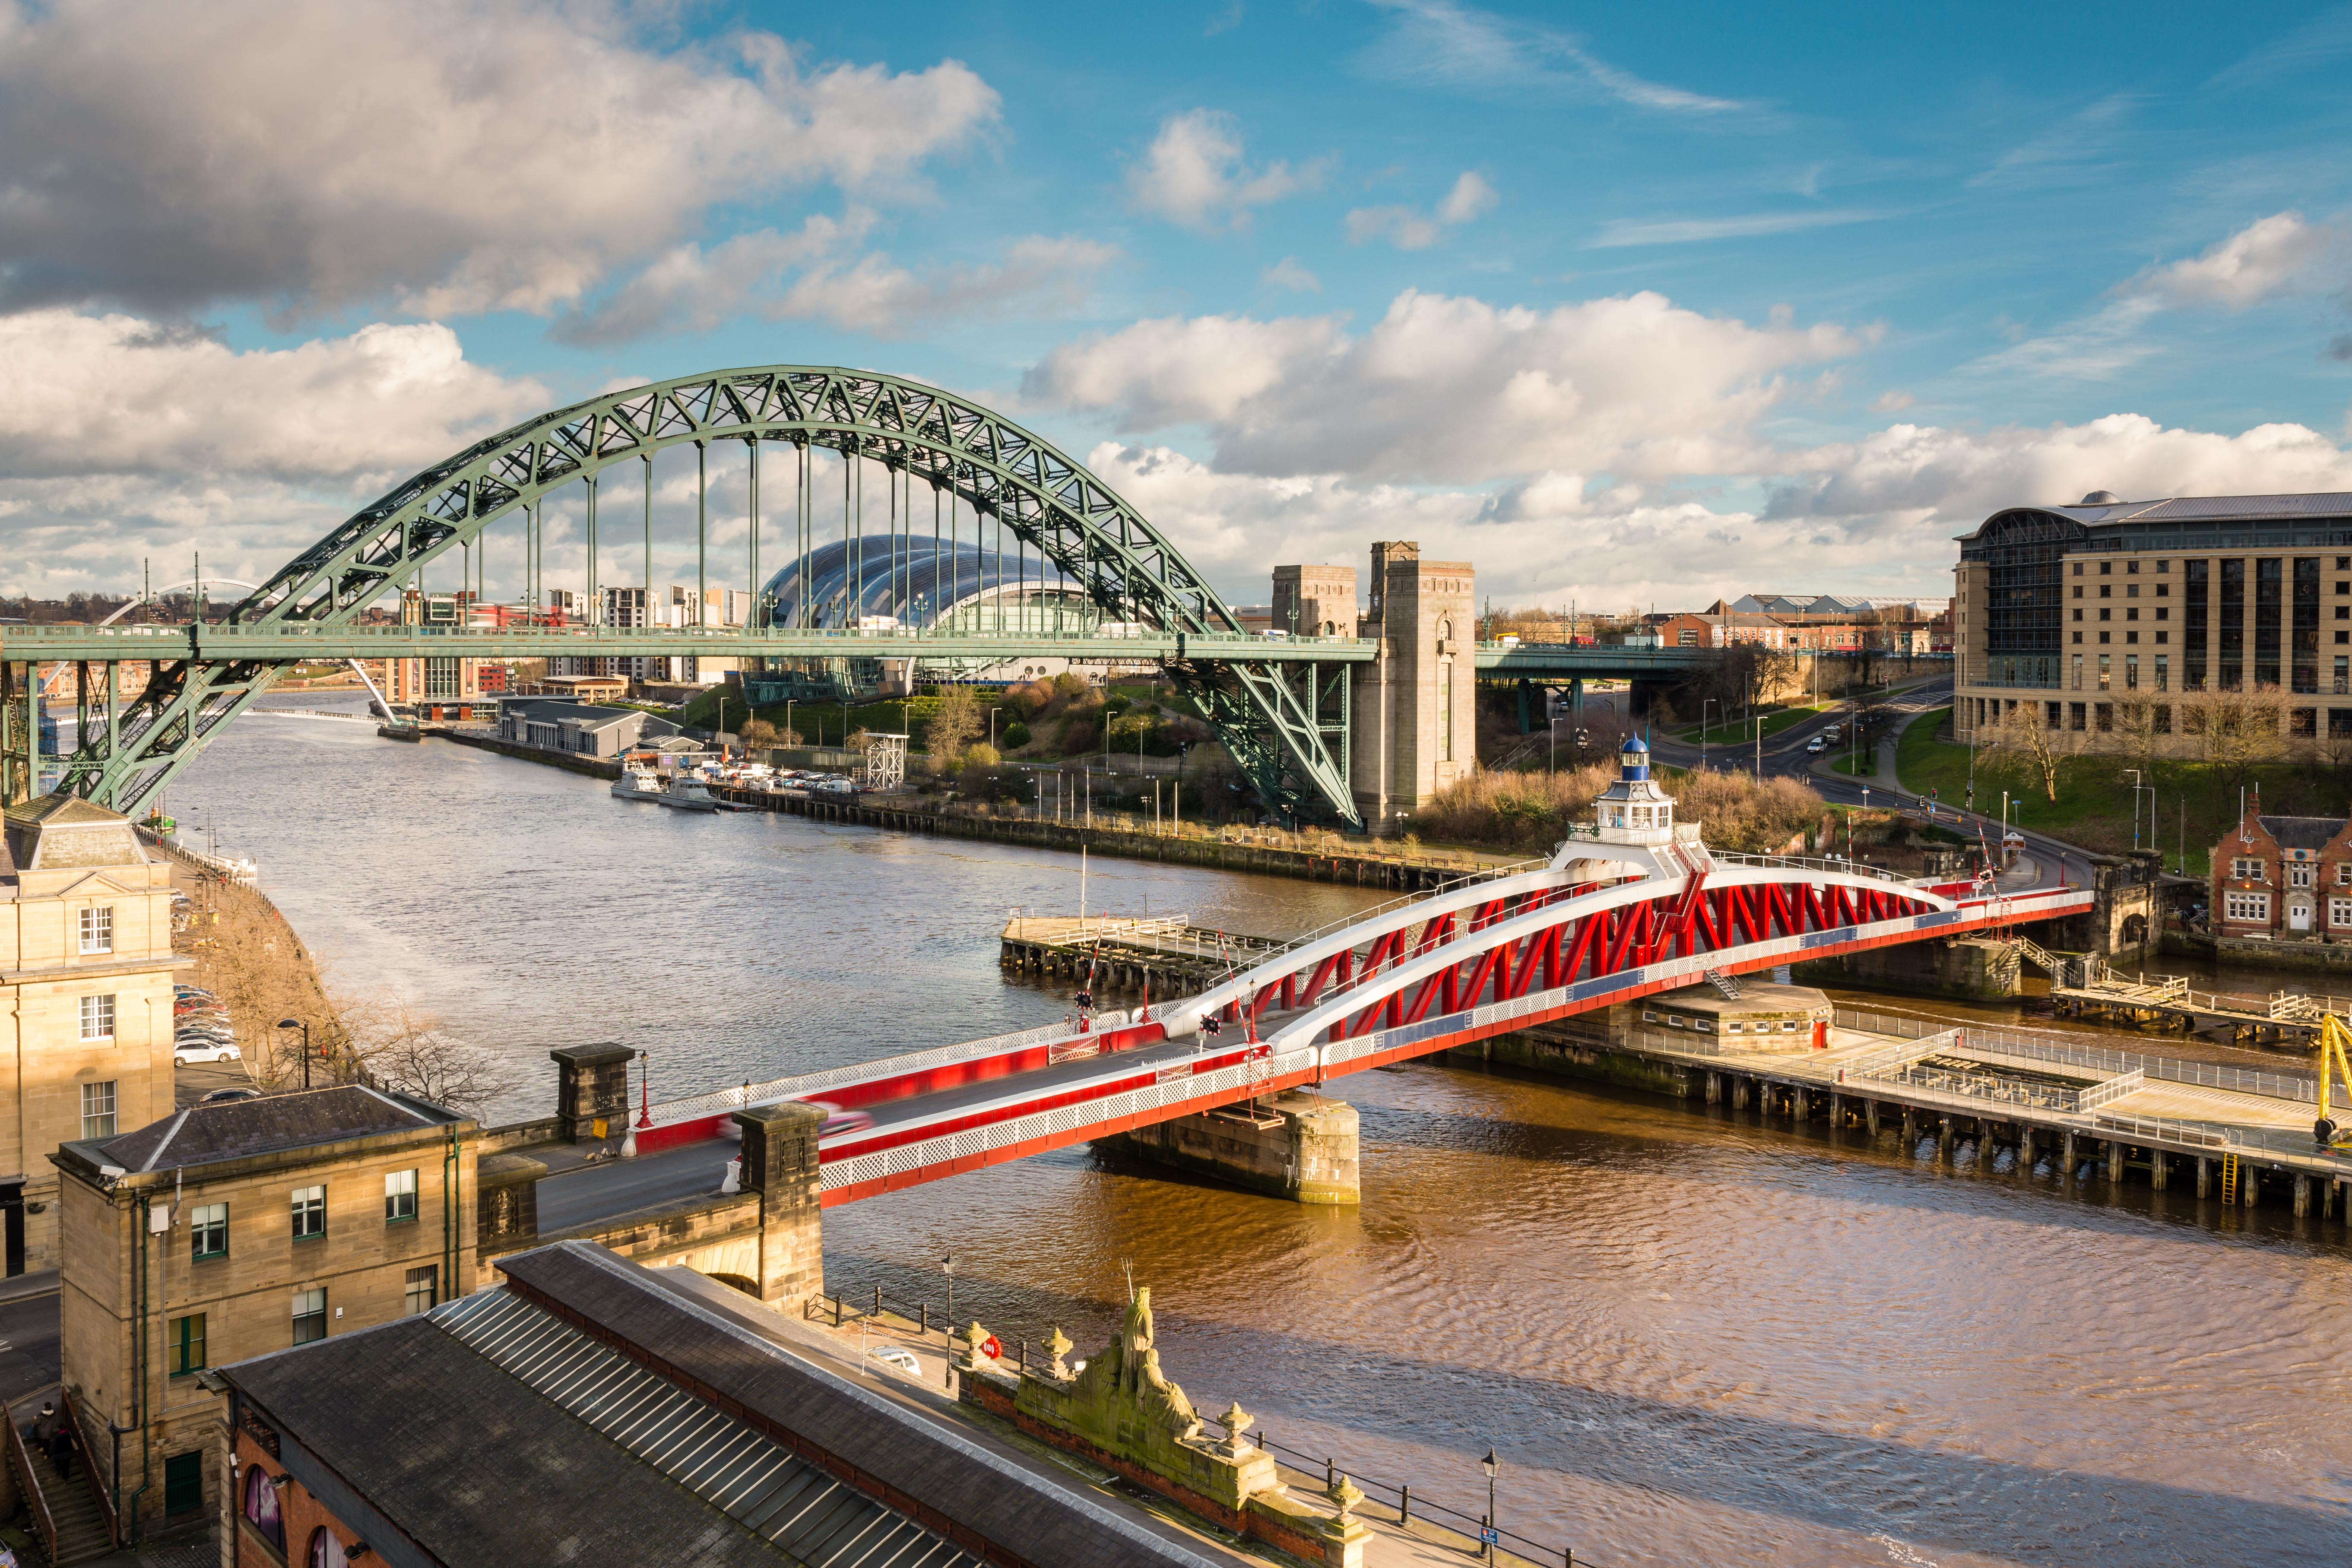 Dating agenzia Newcastle upon Tyne